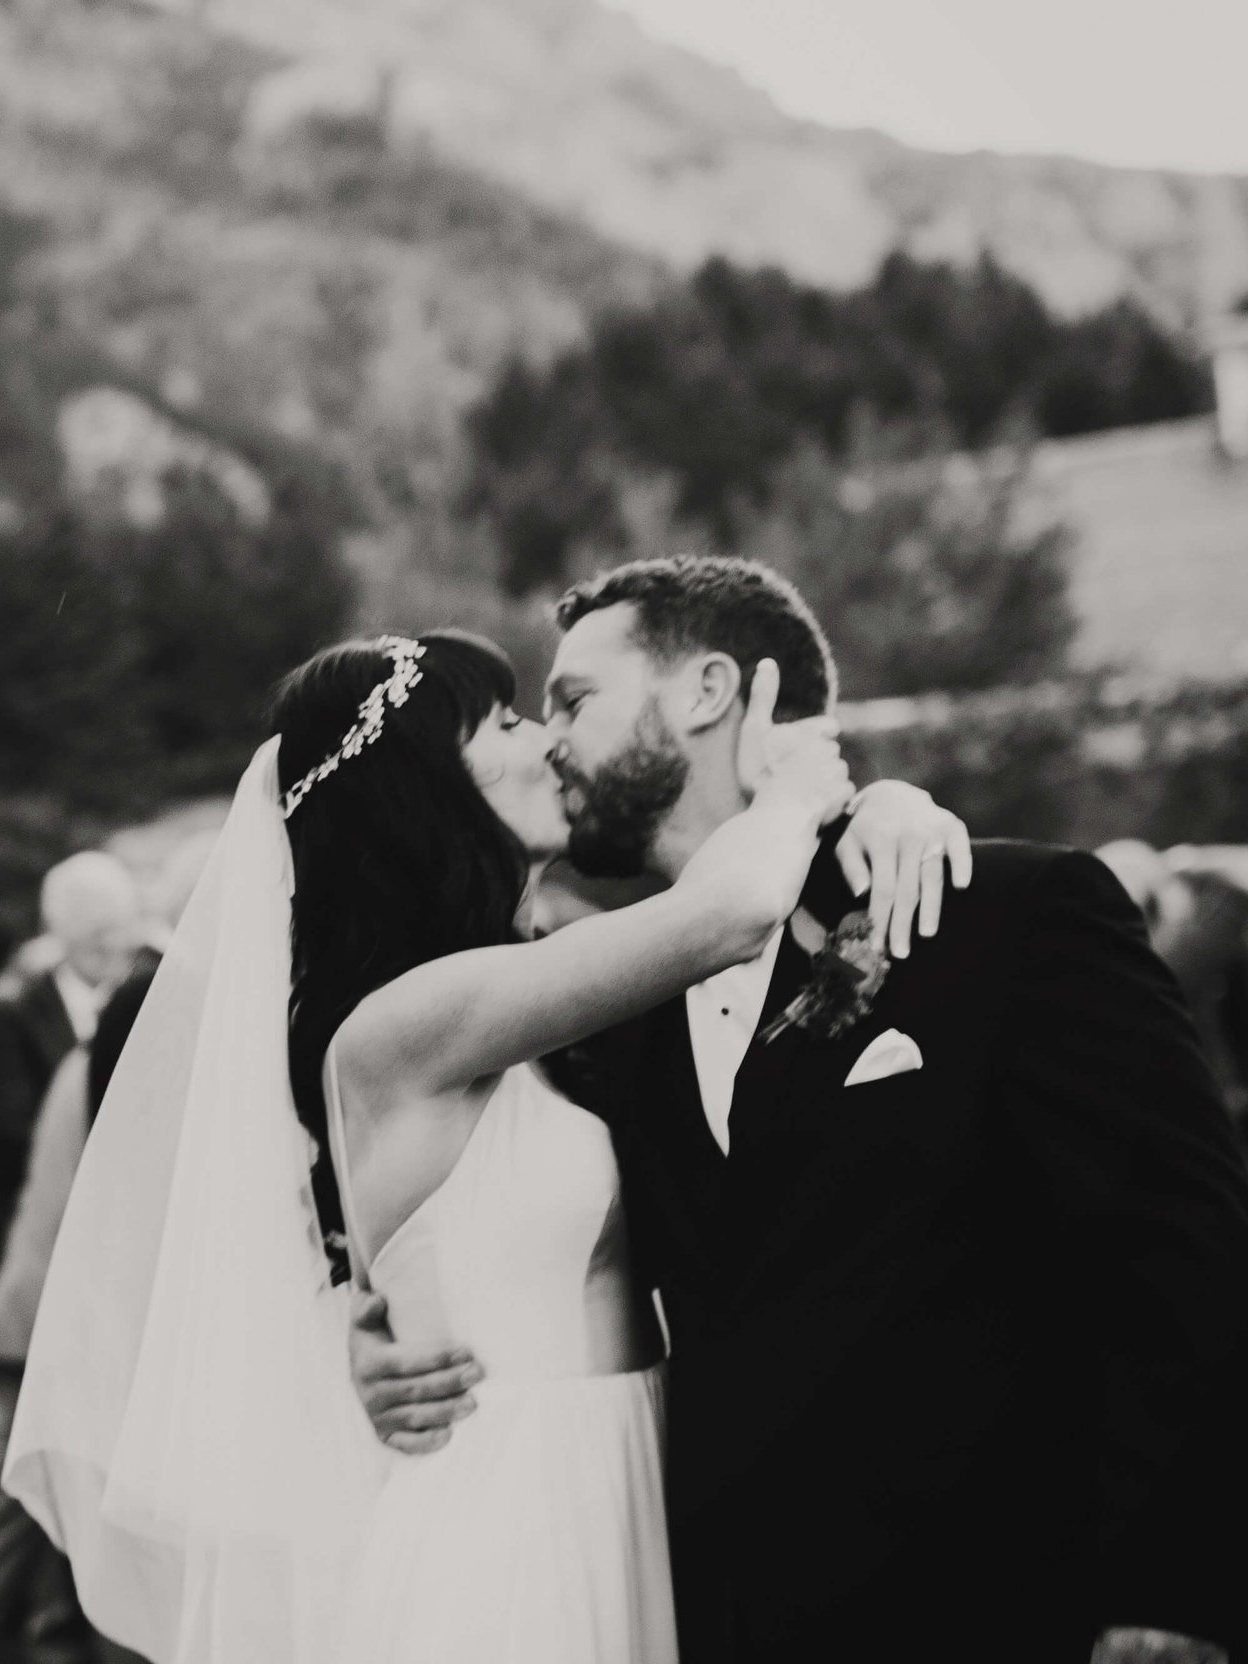 engle-olson-fran-ze-photo-montana-wedding-88.jpg